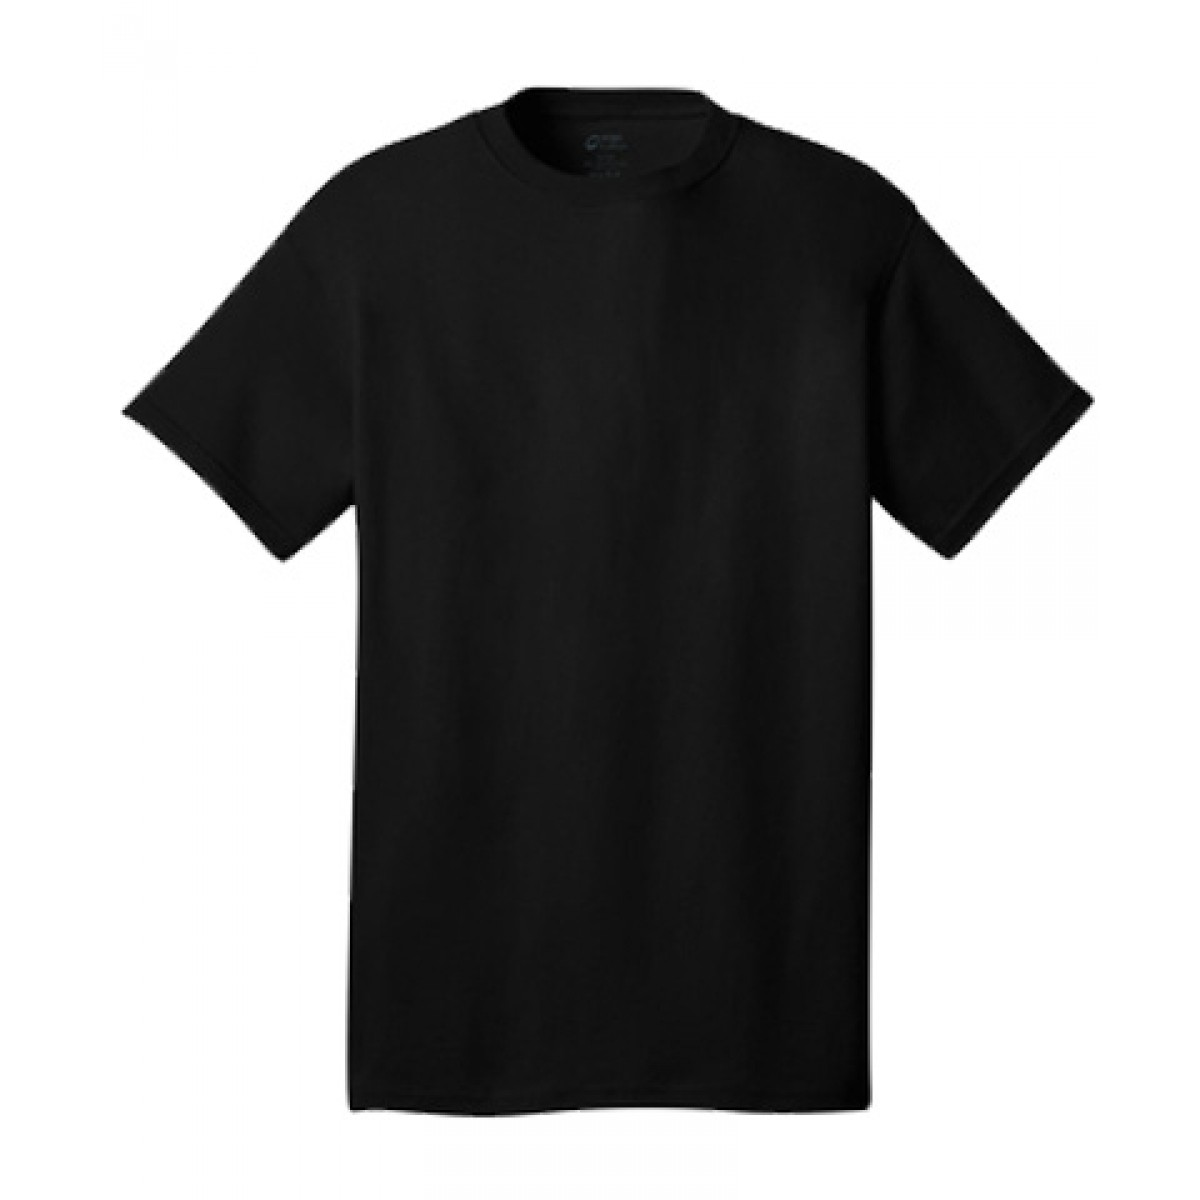 Cotton Short Sleeve T-Shirt-Black-M